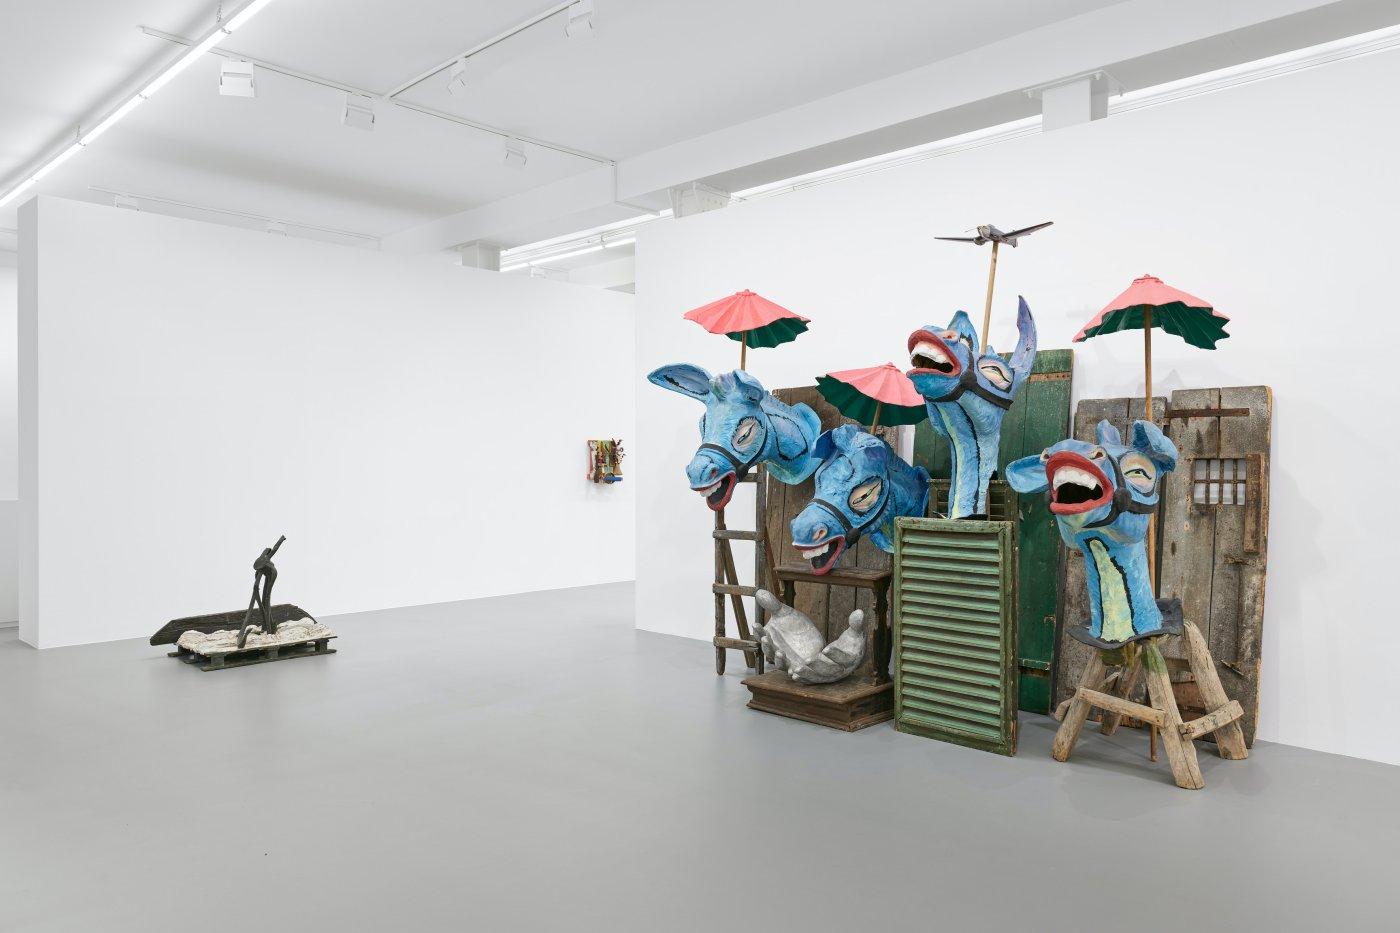 Galerie Max Hetzler Goethestrasse Karel Appel 9